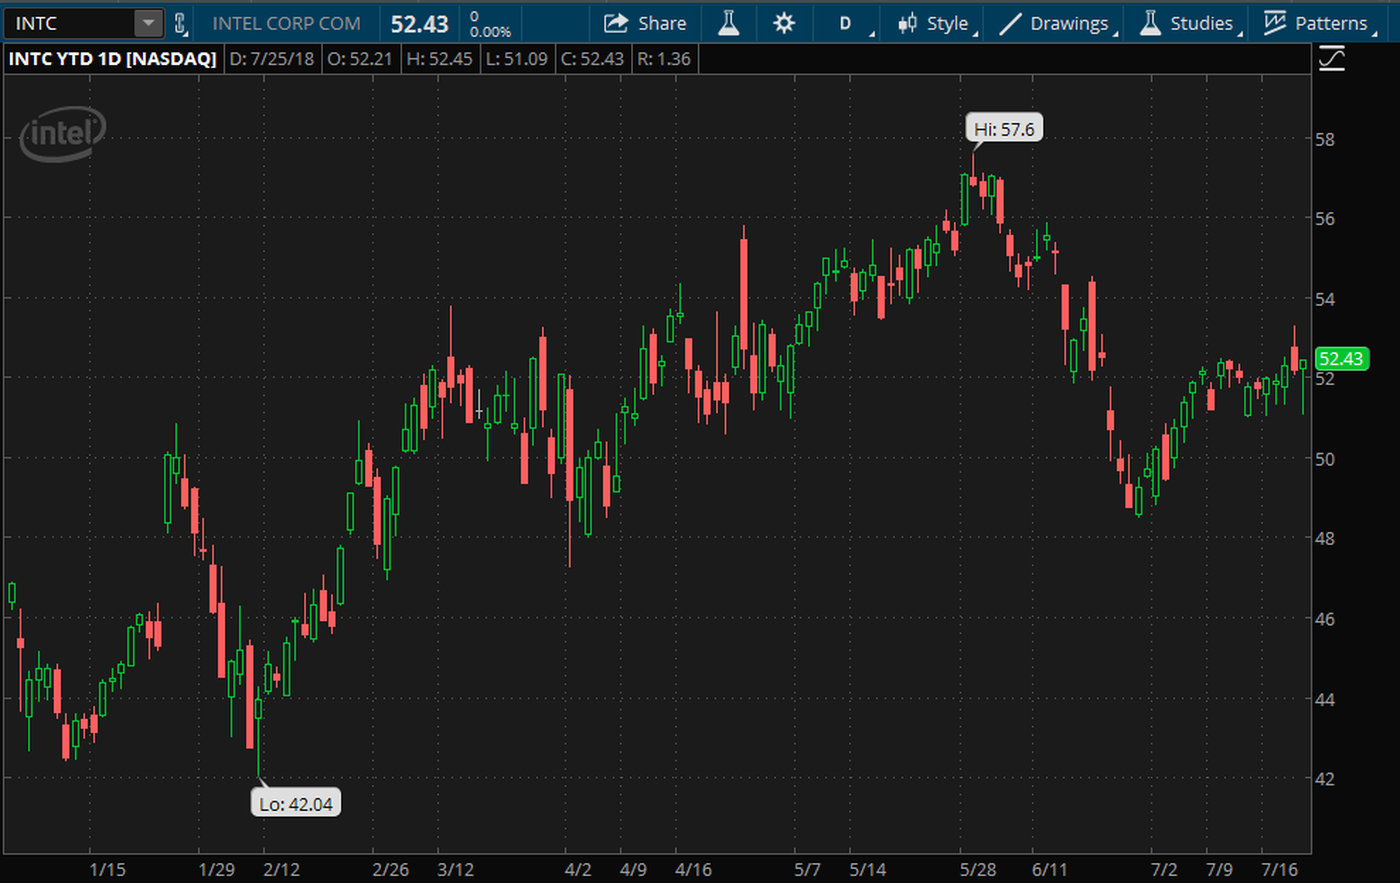 Intc Stock Quote | Intc Stock